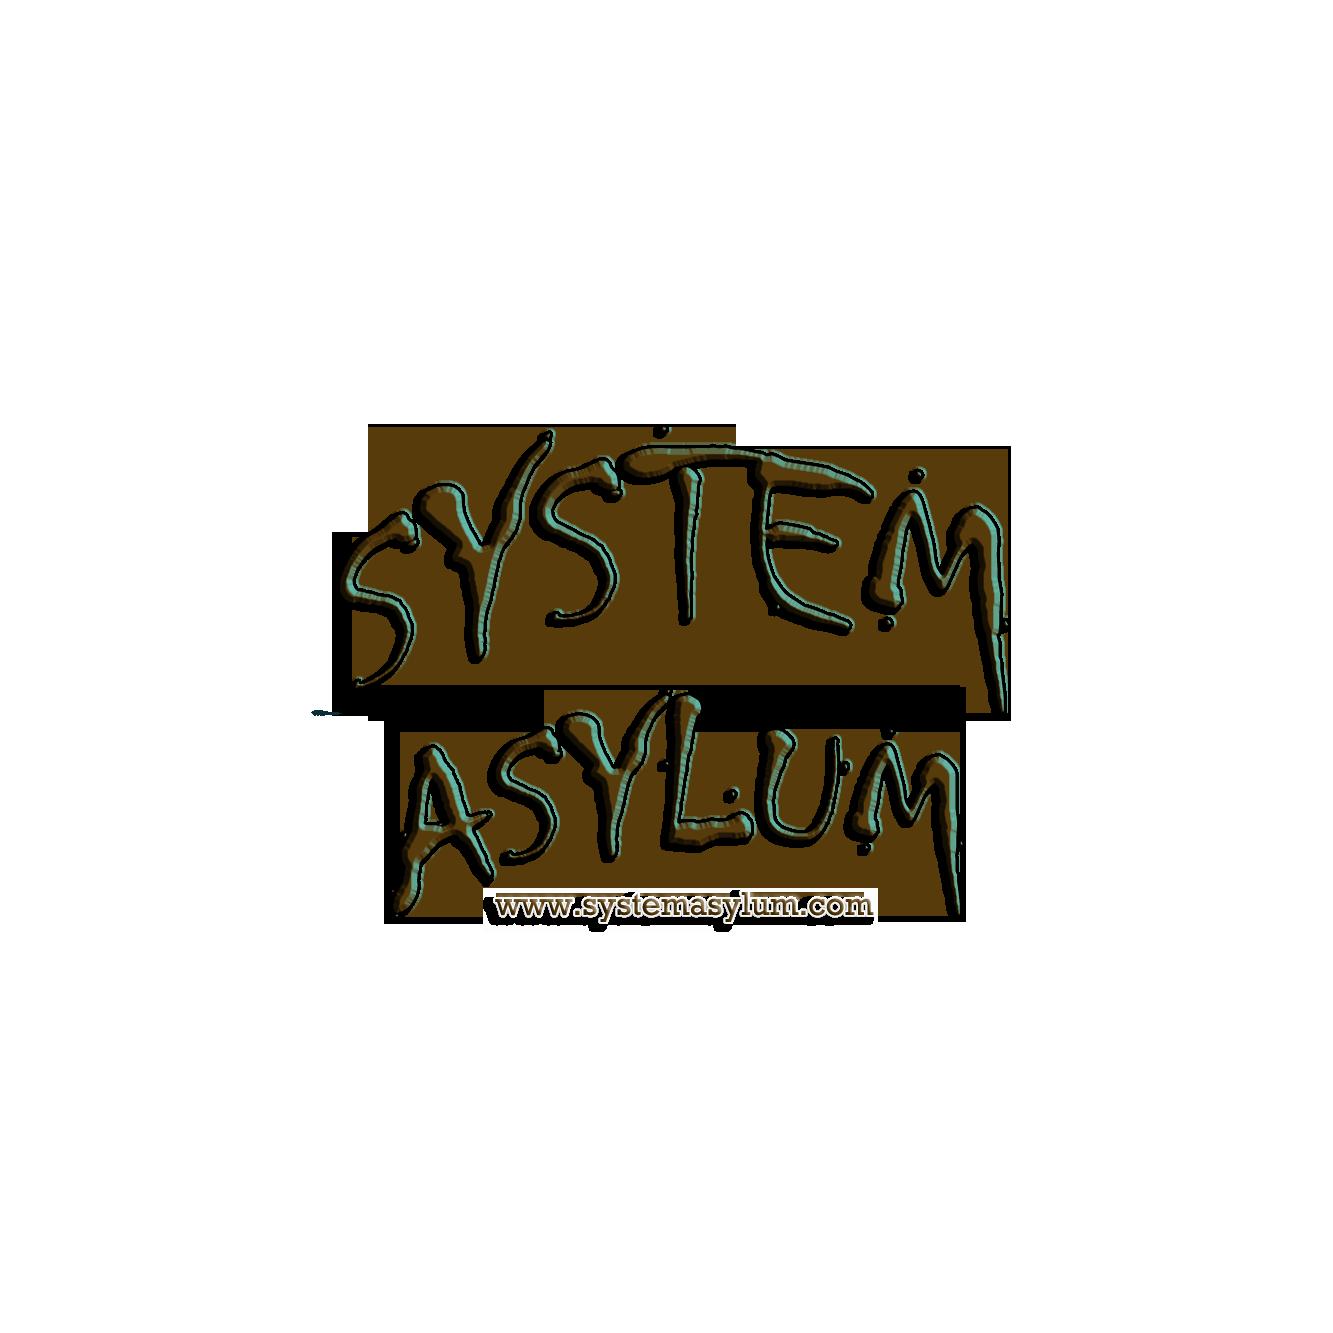 System Asylum logo